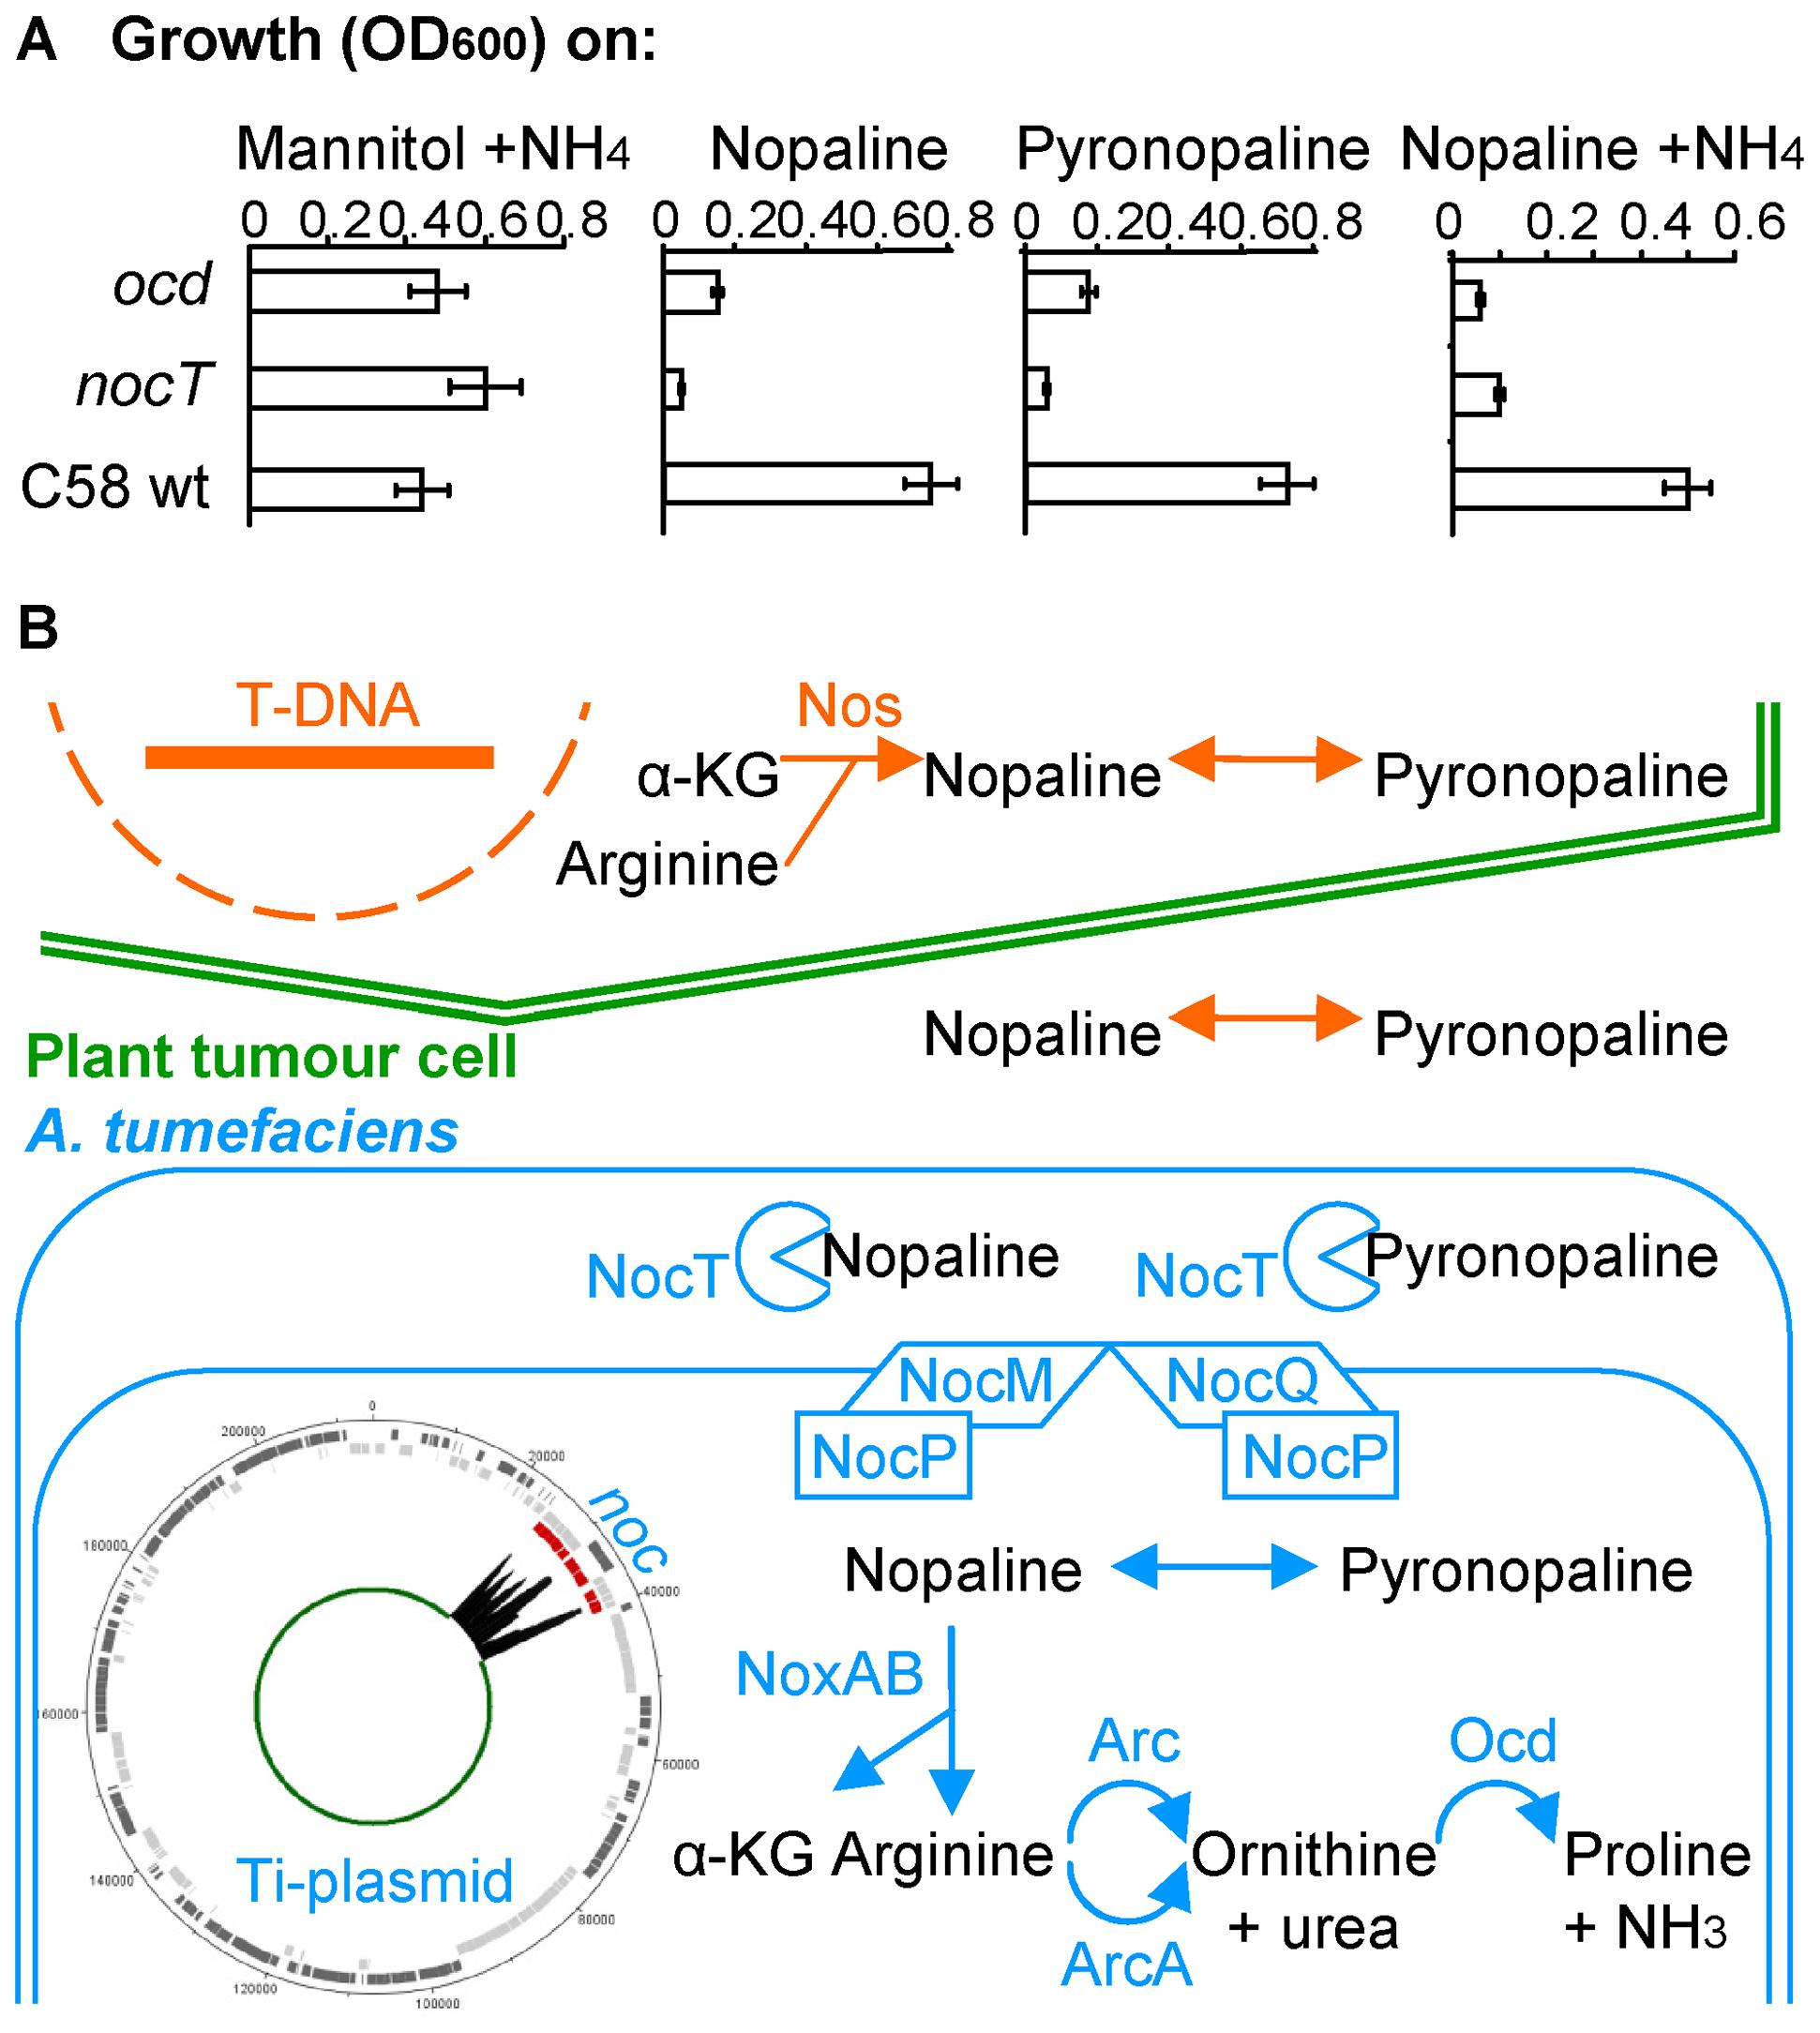 The nopaline/pyronopaline regulon in <i>A. tumefaciens</i> C58.